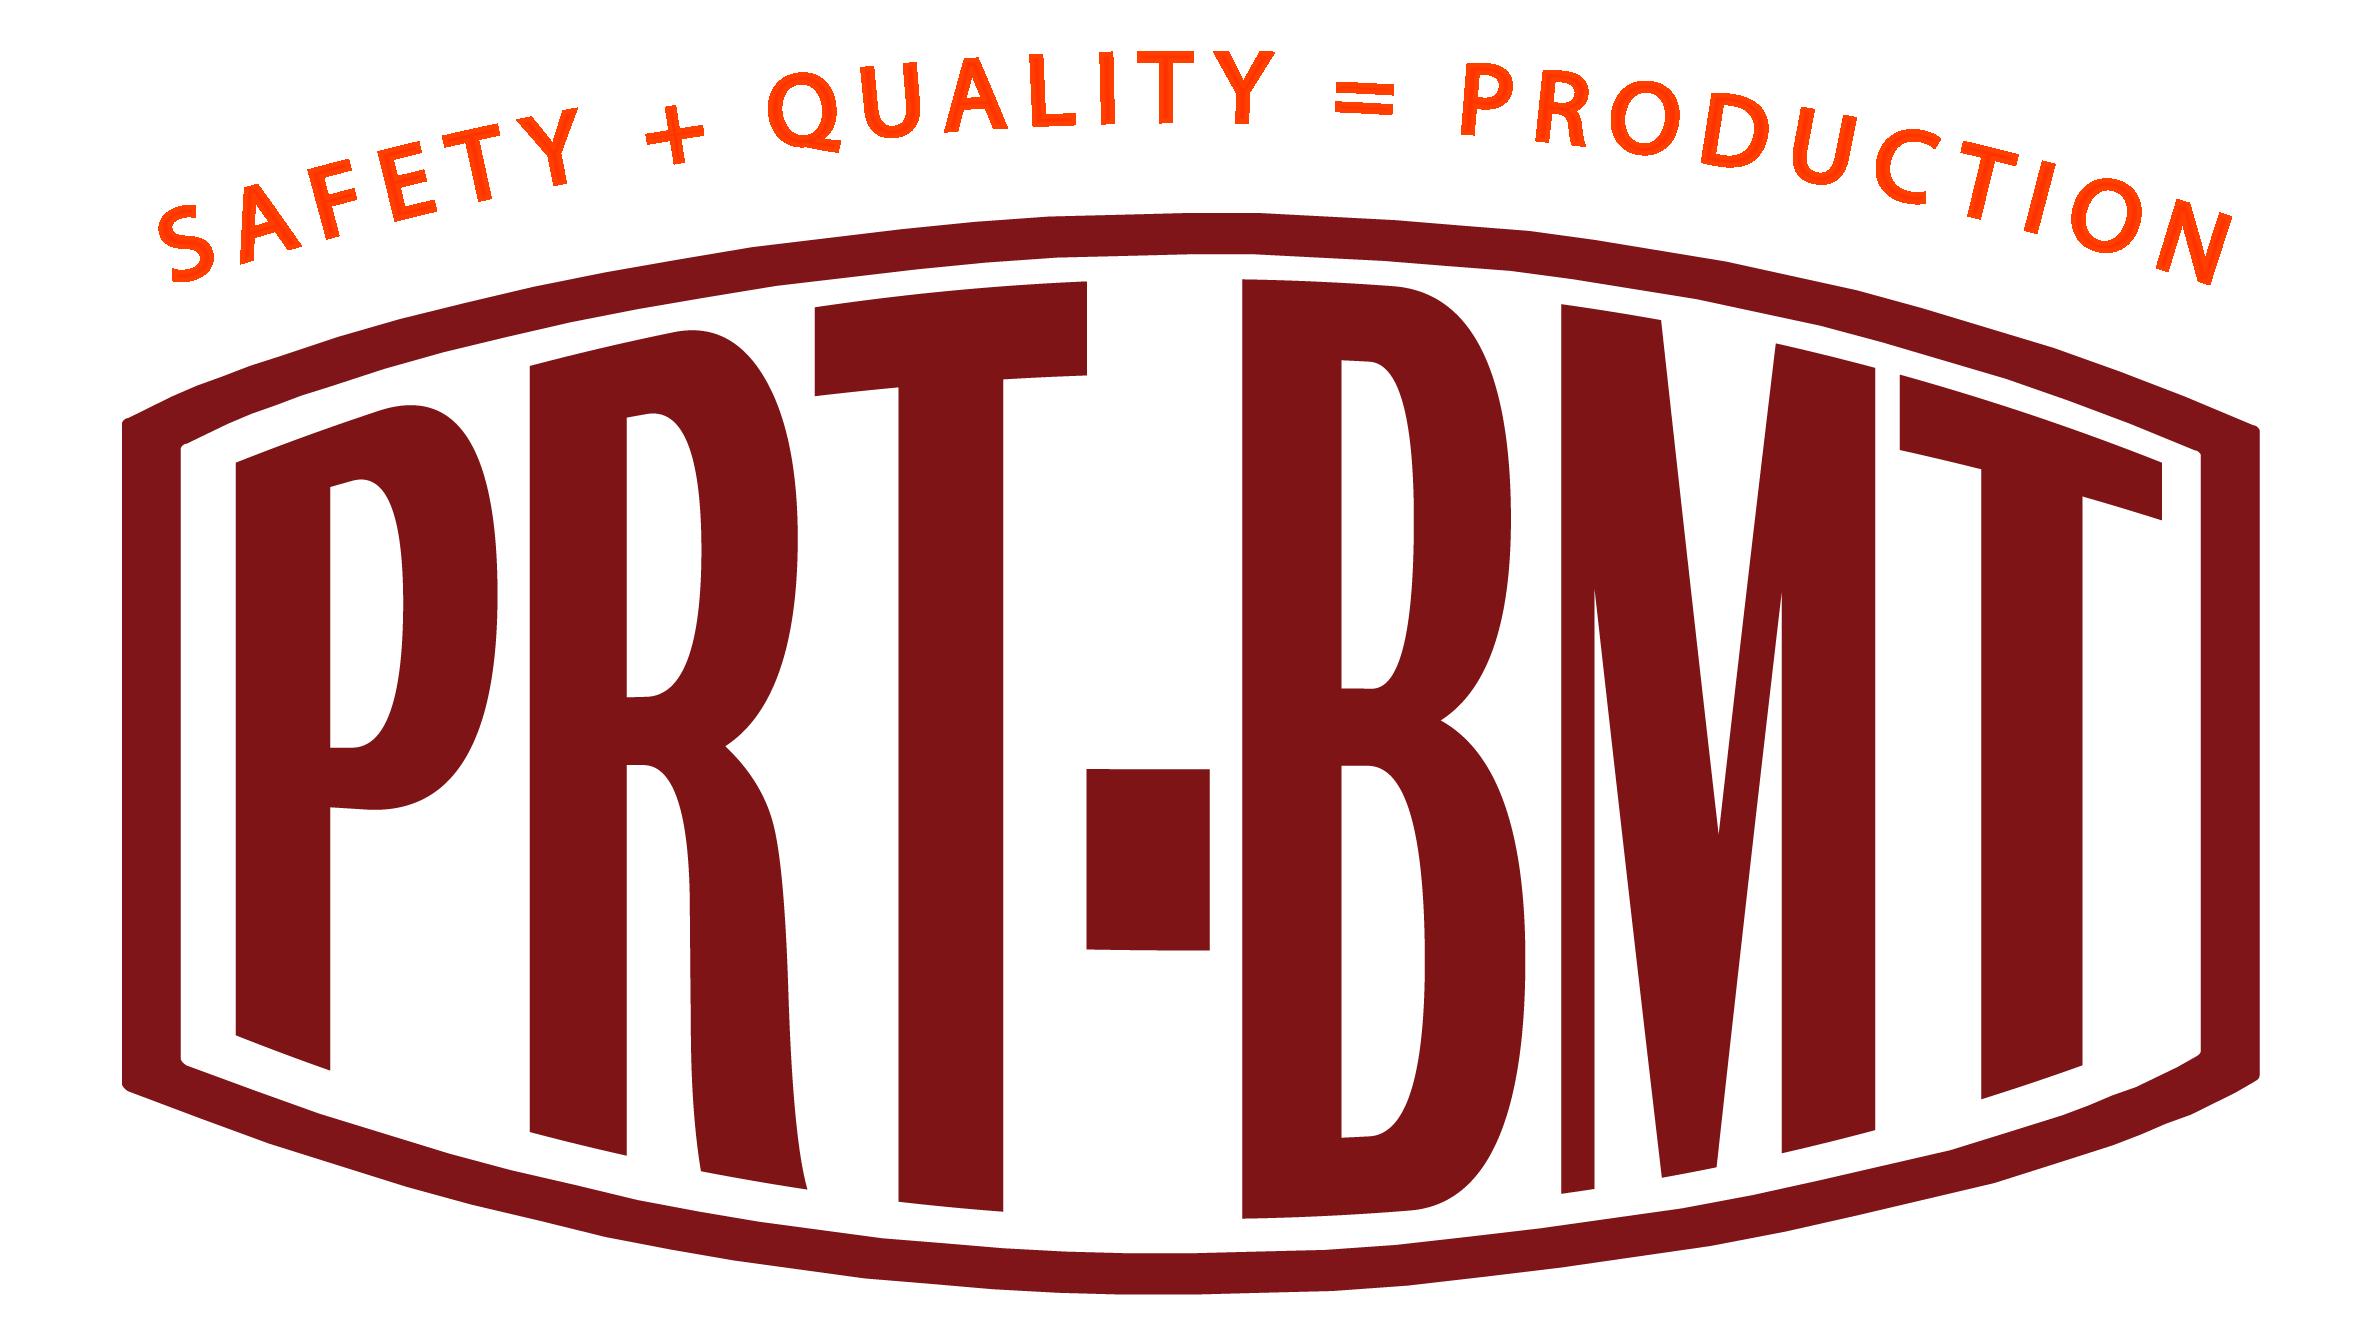 PRT-BMT_blk__LogoCur10132016f-02